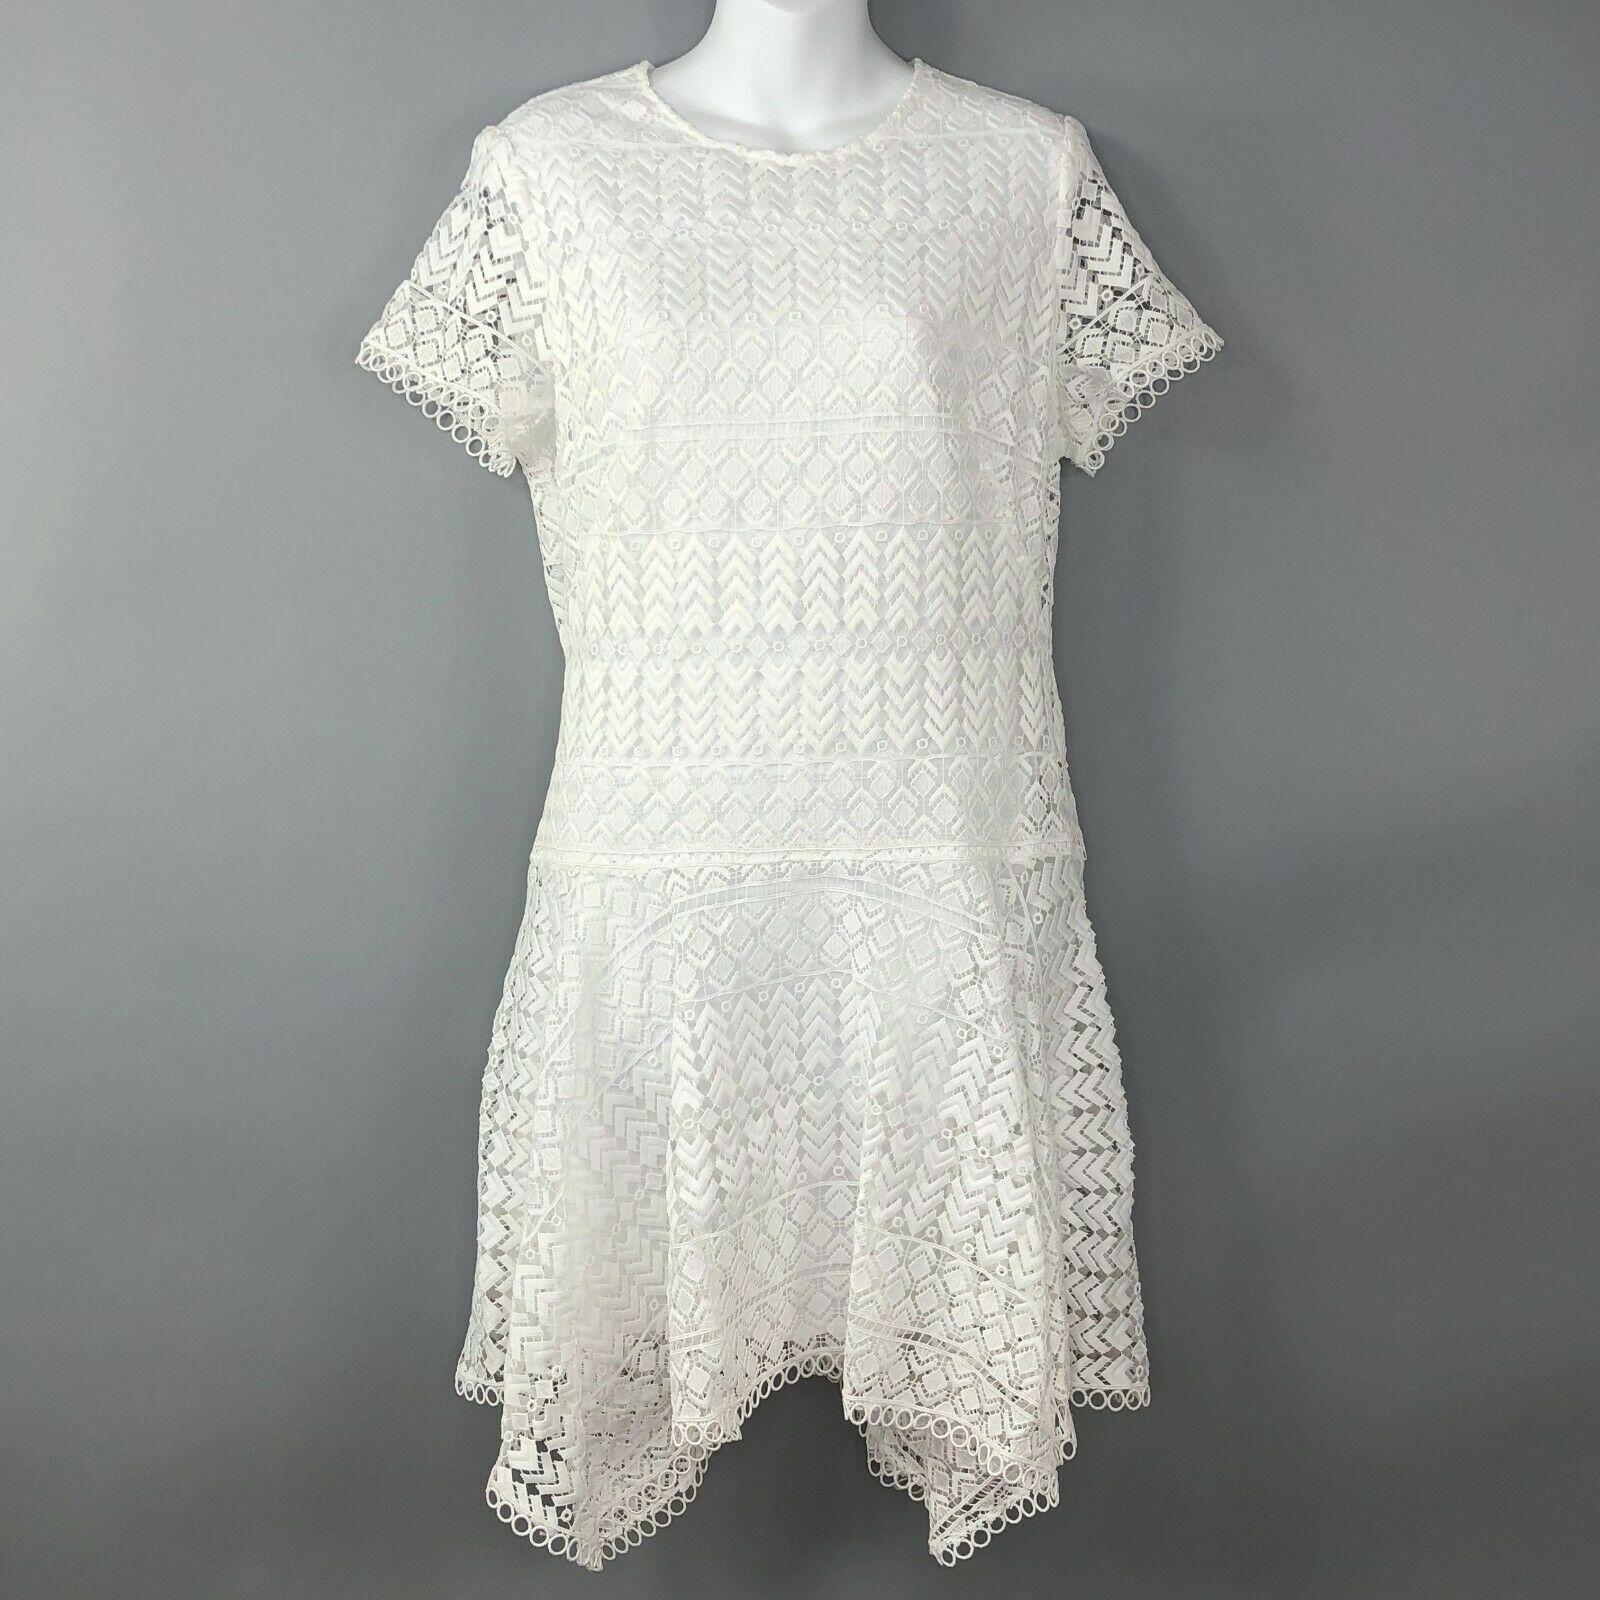 Anthropologie Shoshanna damen Dress Größe 10 Short Sleeve Weiß Lace Anika Hanky